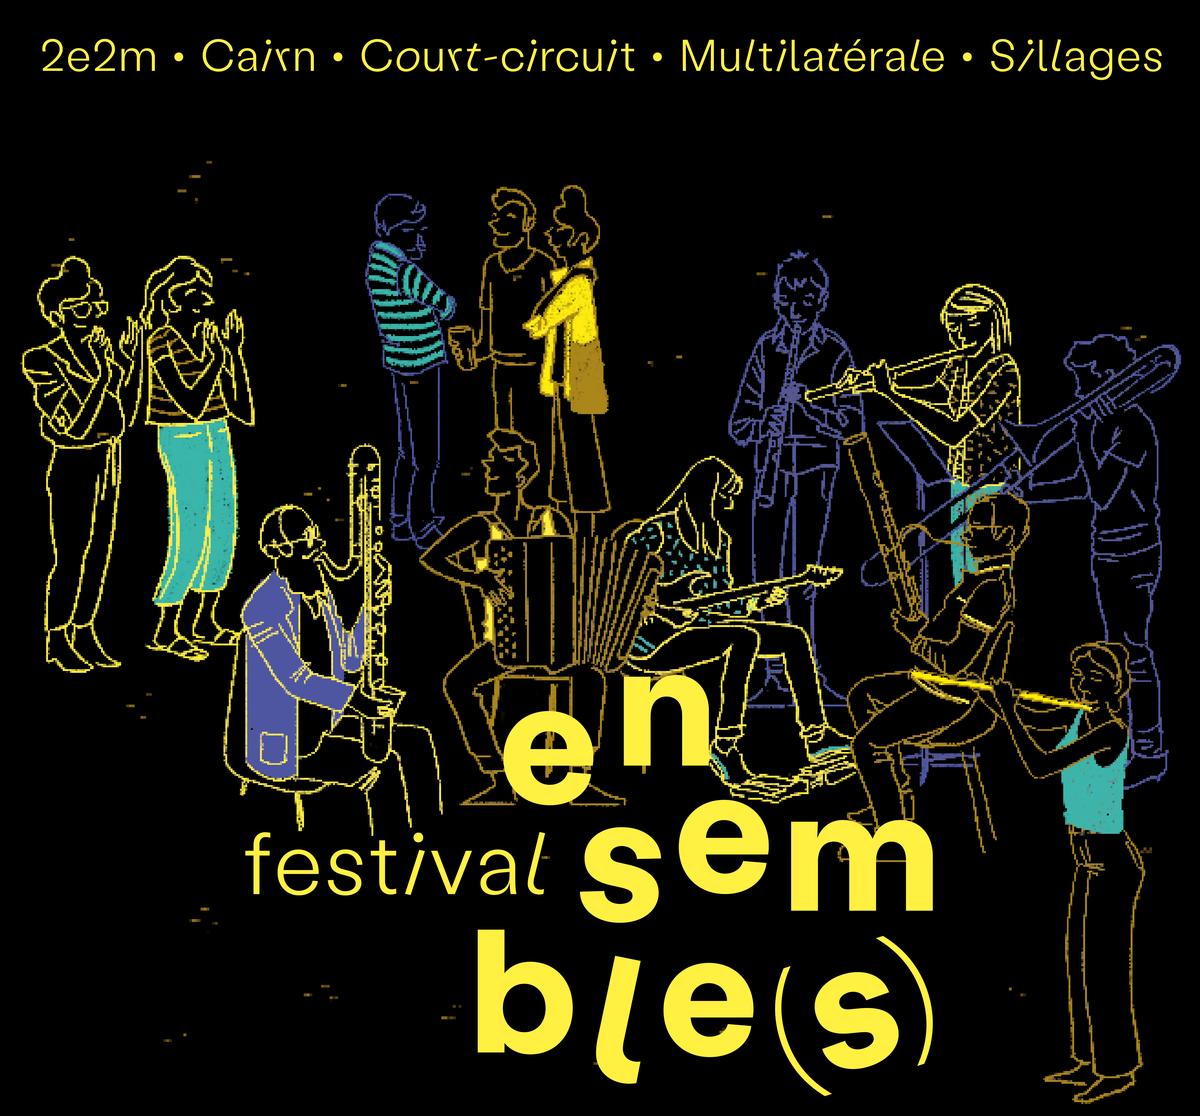 Festival Ensemble(s) 21